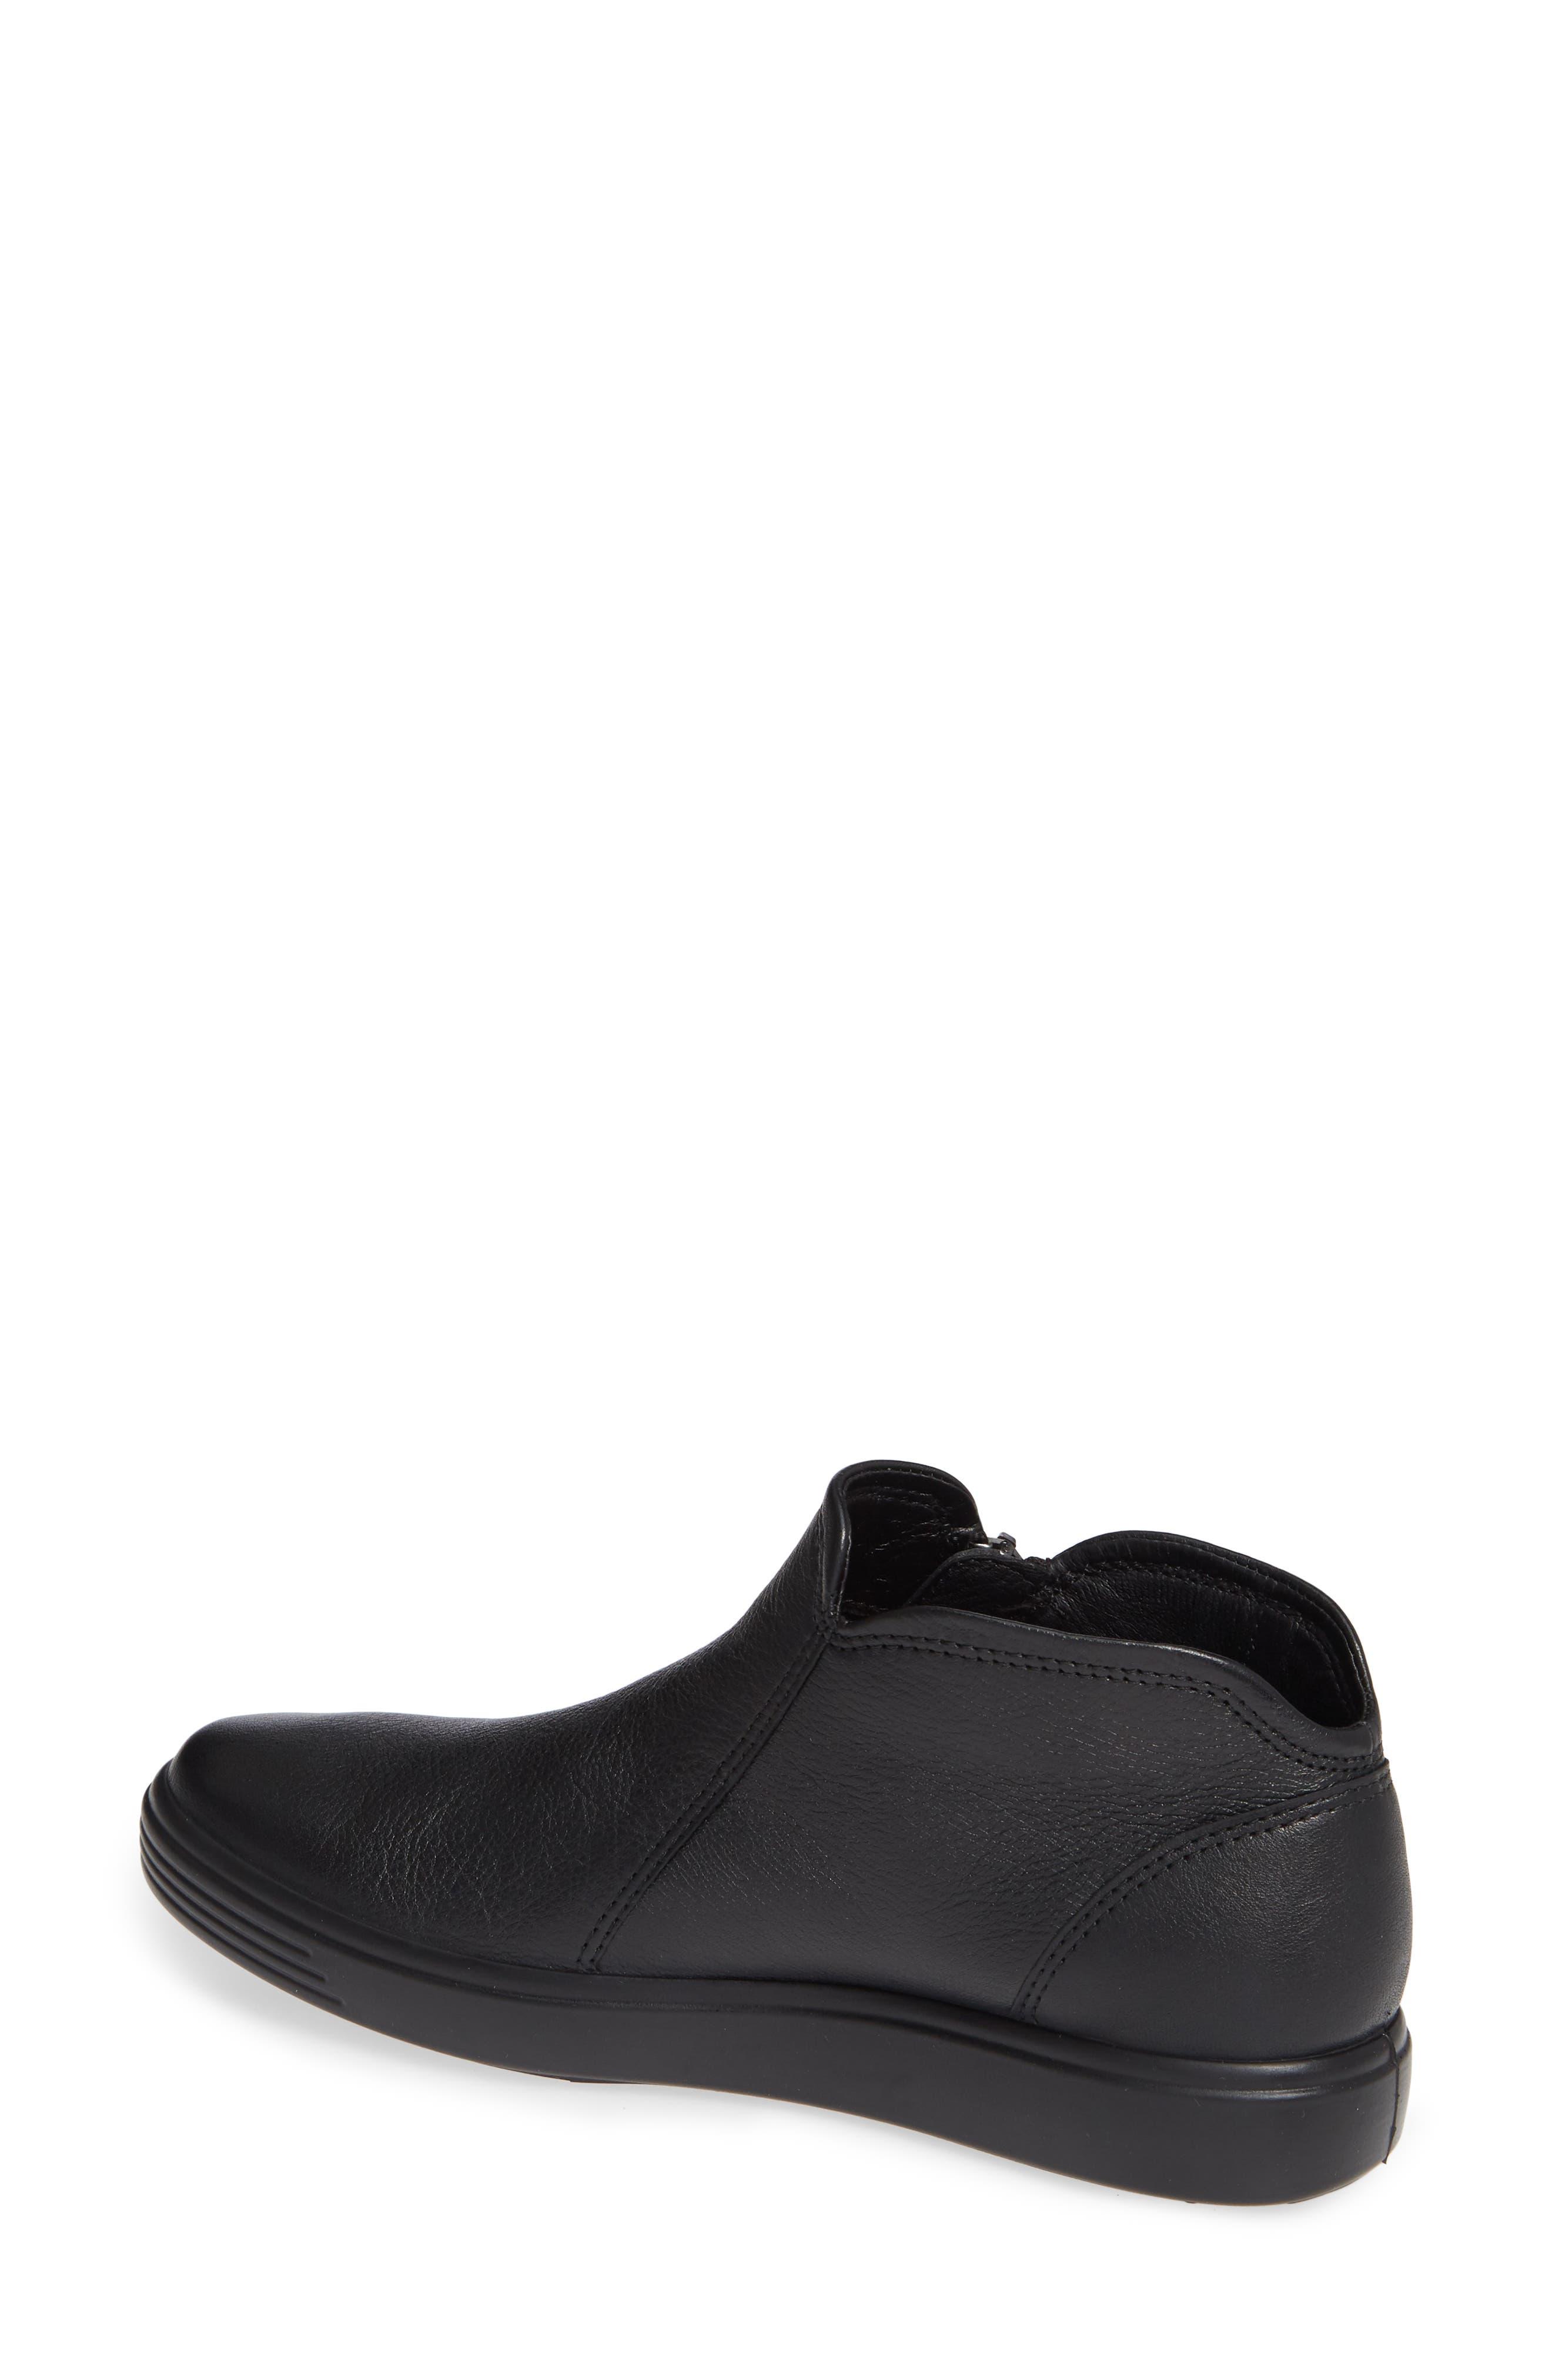 ECCO, Soft 7 Mid Top Sneaker, Alternate thumbnail 2, color, BLACK/ BLACK LEATHER